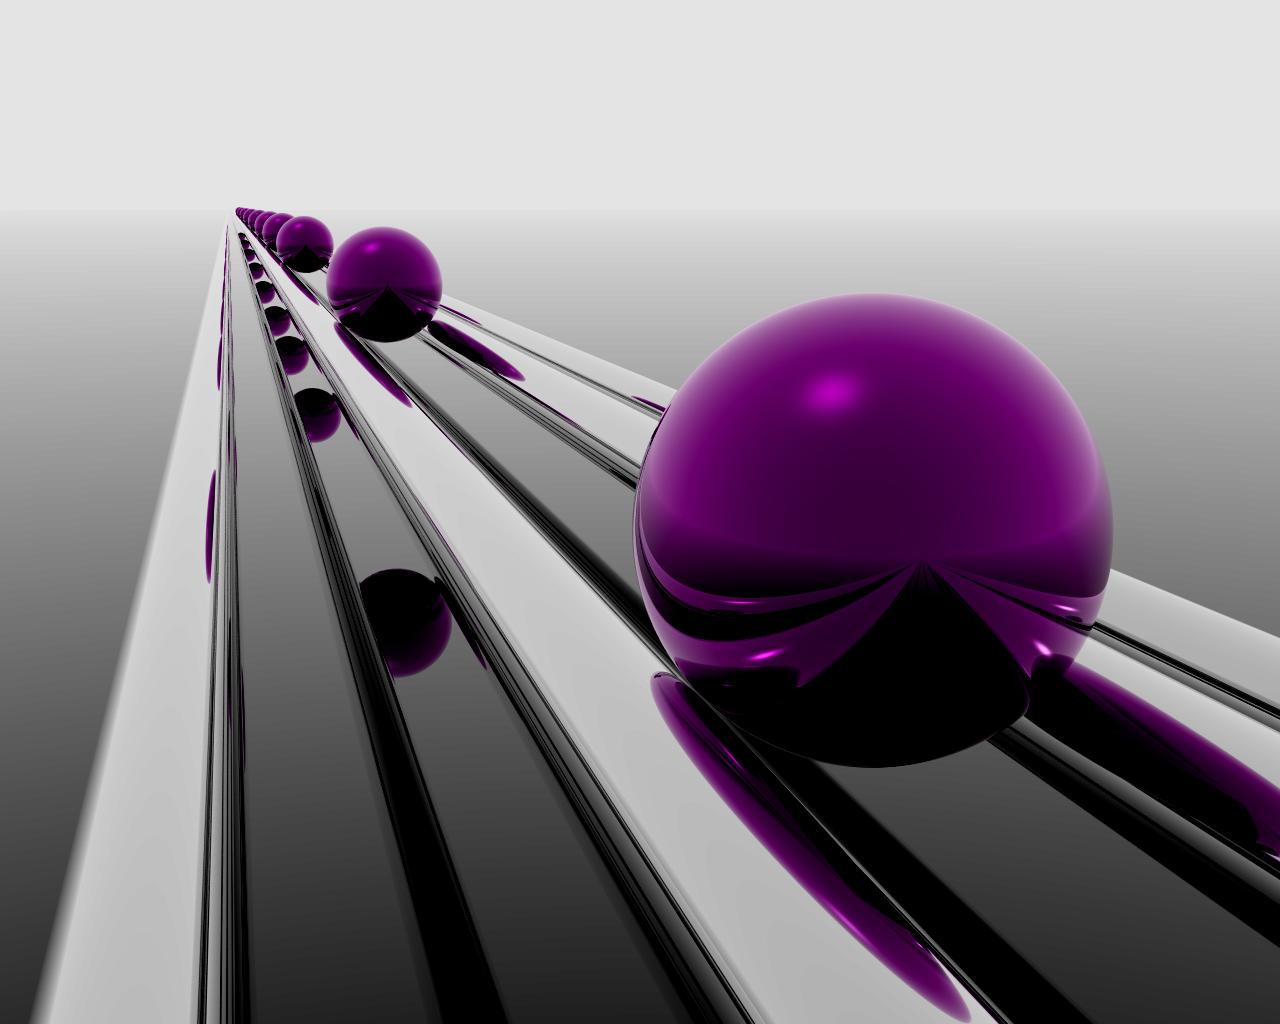 purple desktop backgrounds 5jpg 1280x1024